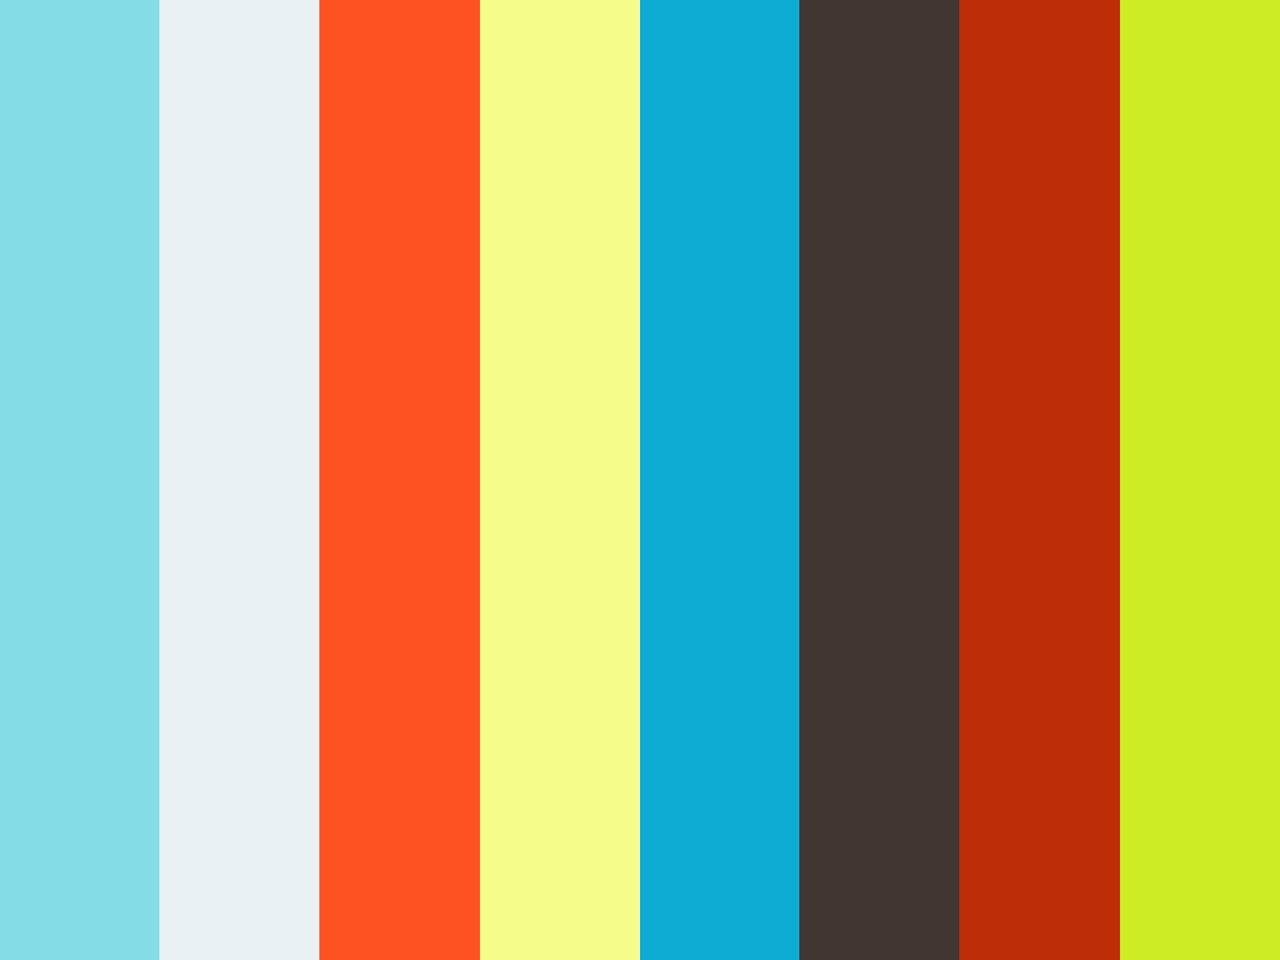 1-3 Renaming, Reordering and Tab Colouring